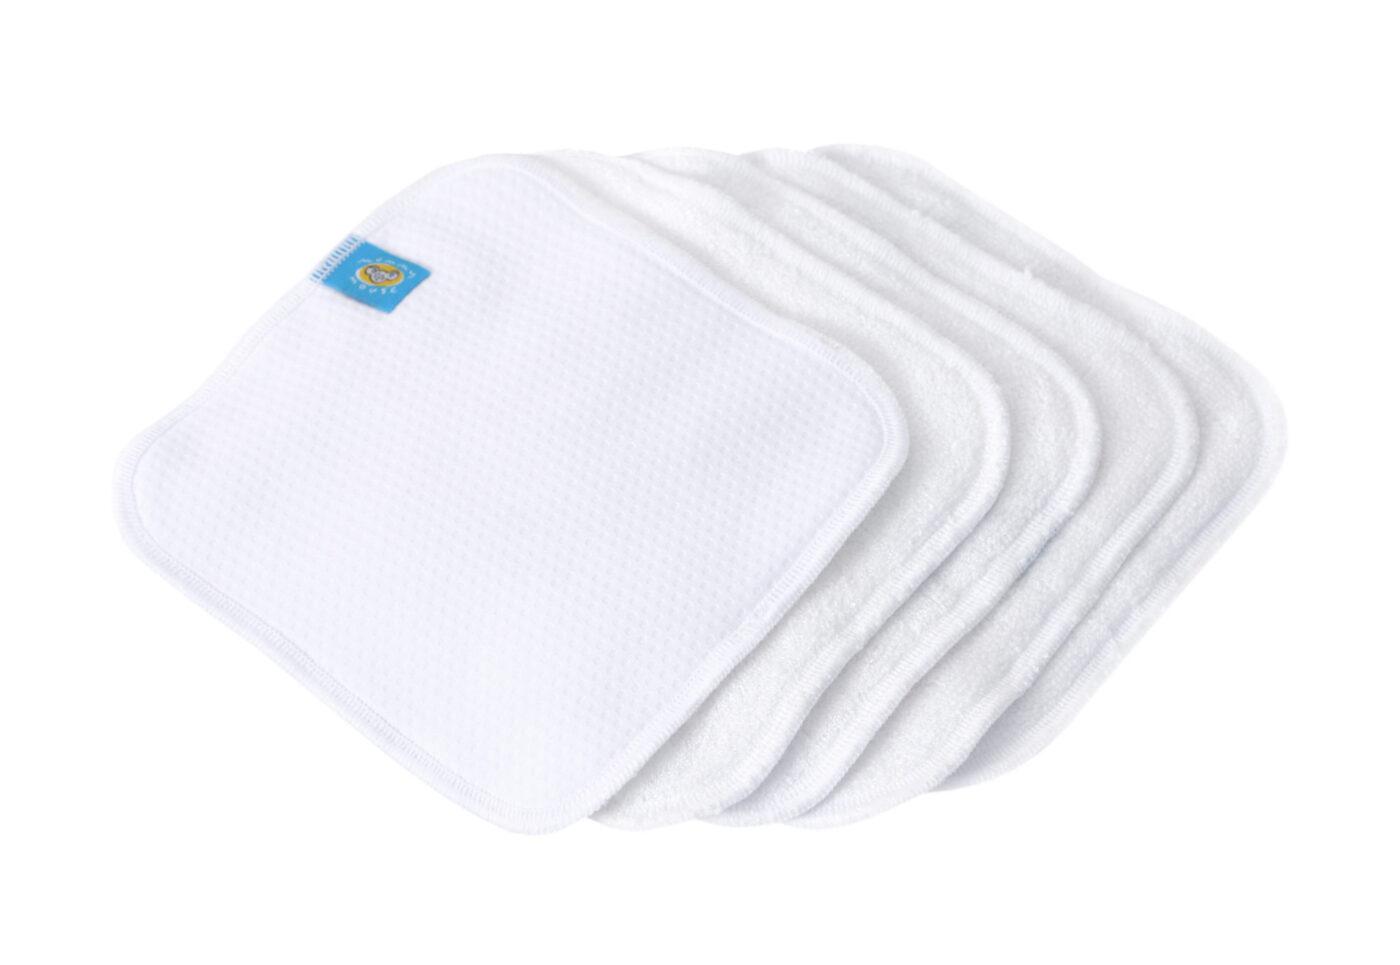 Reusable Wipe Pouch AQUA + 5pcs Reusable Wipes (CHEESE)